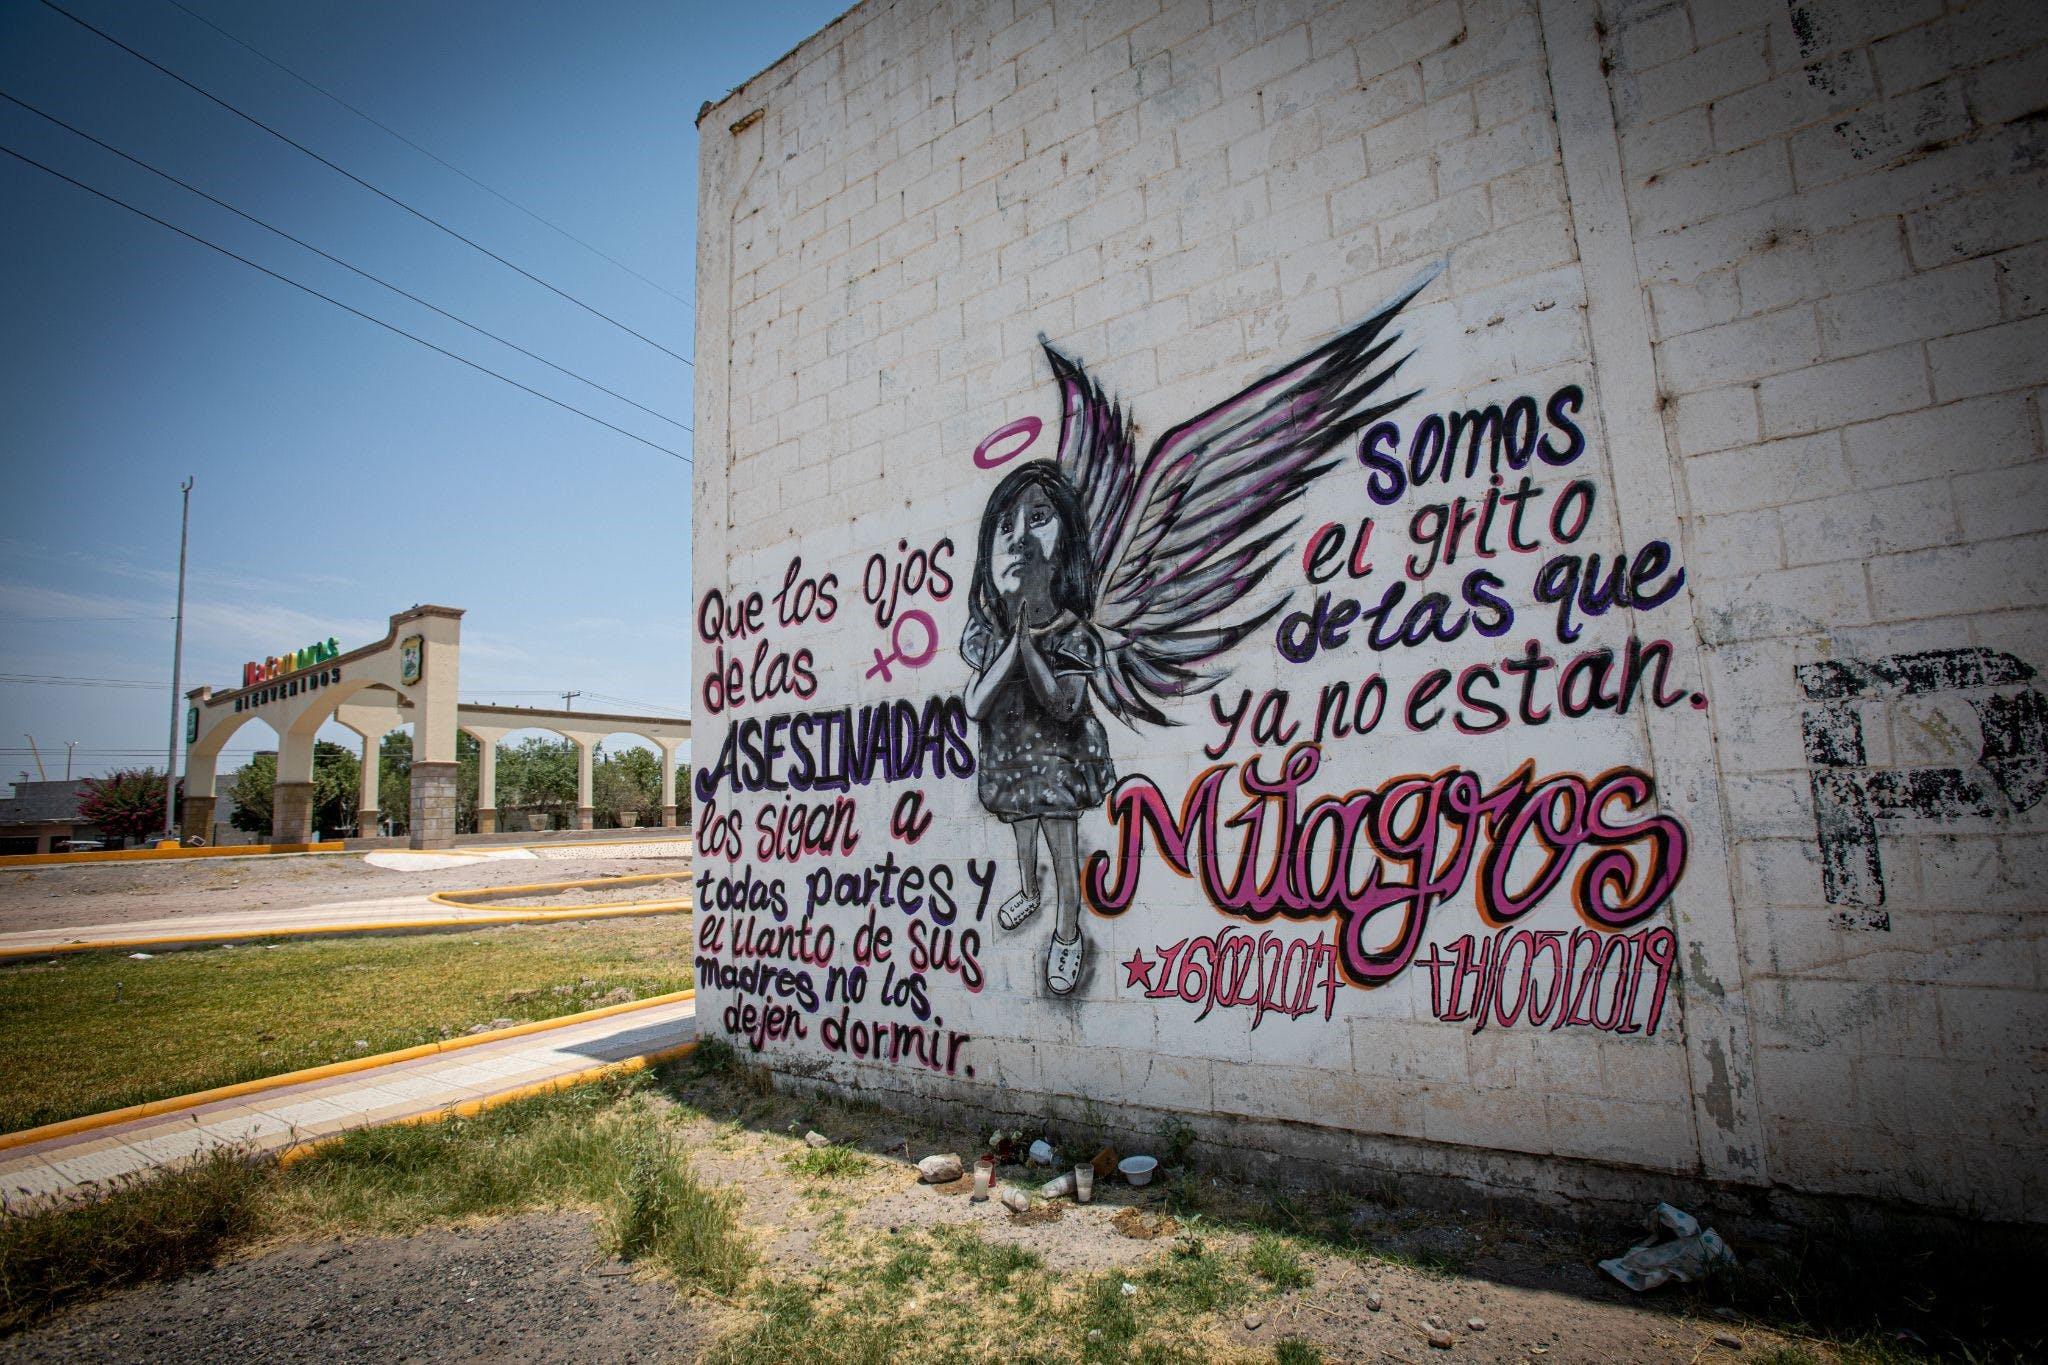 Un mural en honor a la niña Milagros en Matamoros, Coahuila.